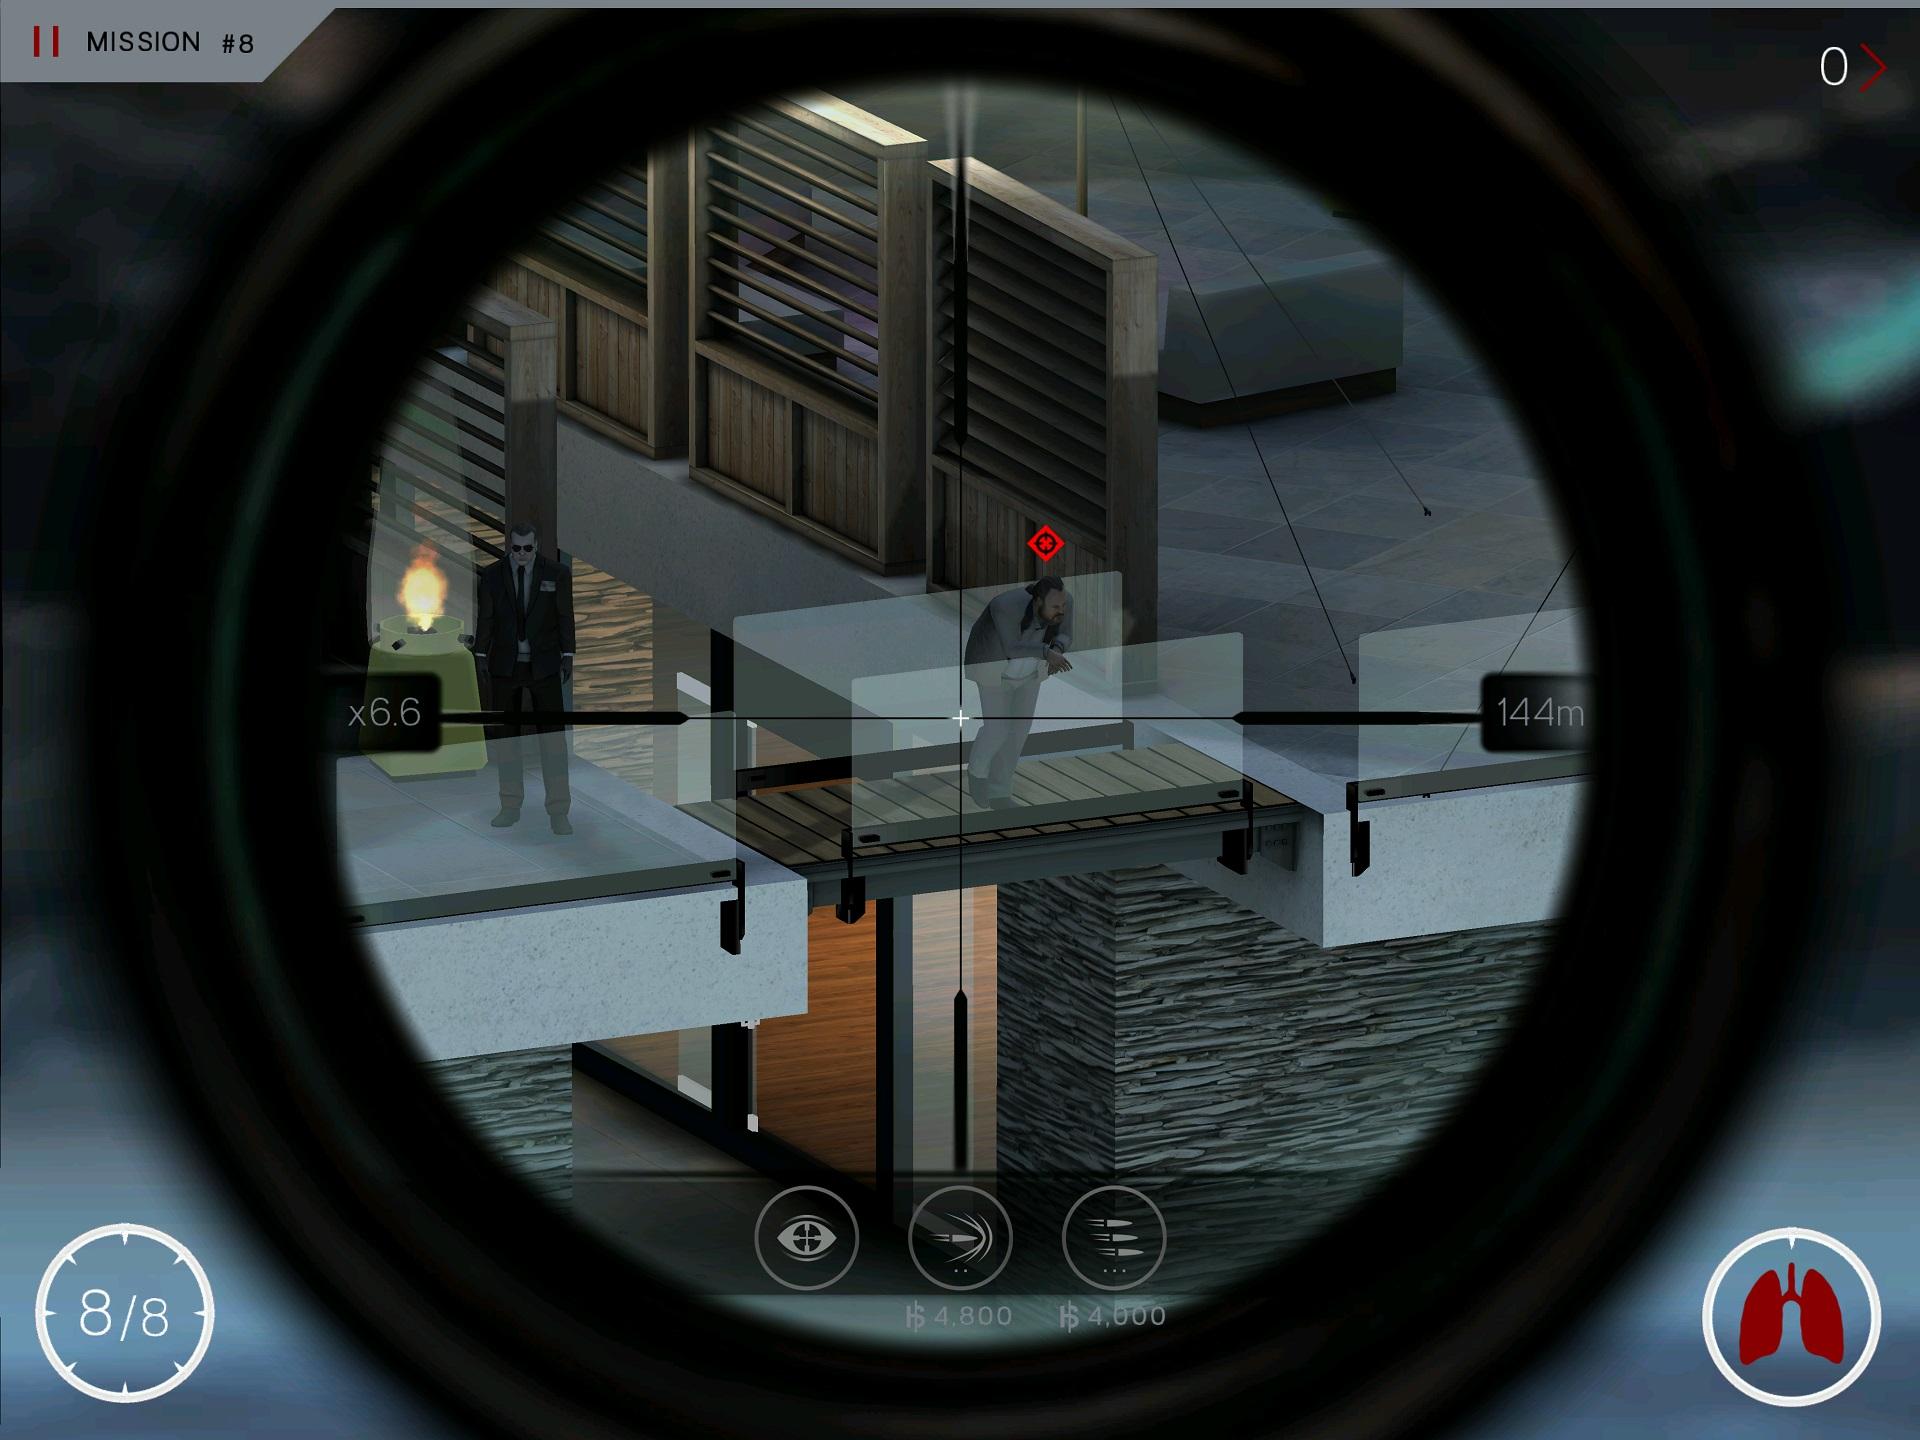 SNIPER_Krug_1401975803 hitman sniper hands on impressions itchy trigger finger shacknews Hitman Sniper Rifle at bayanpartner.co